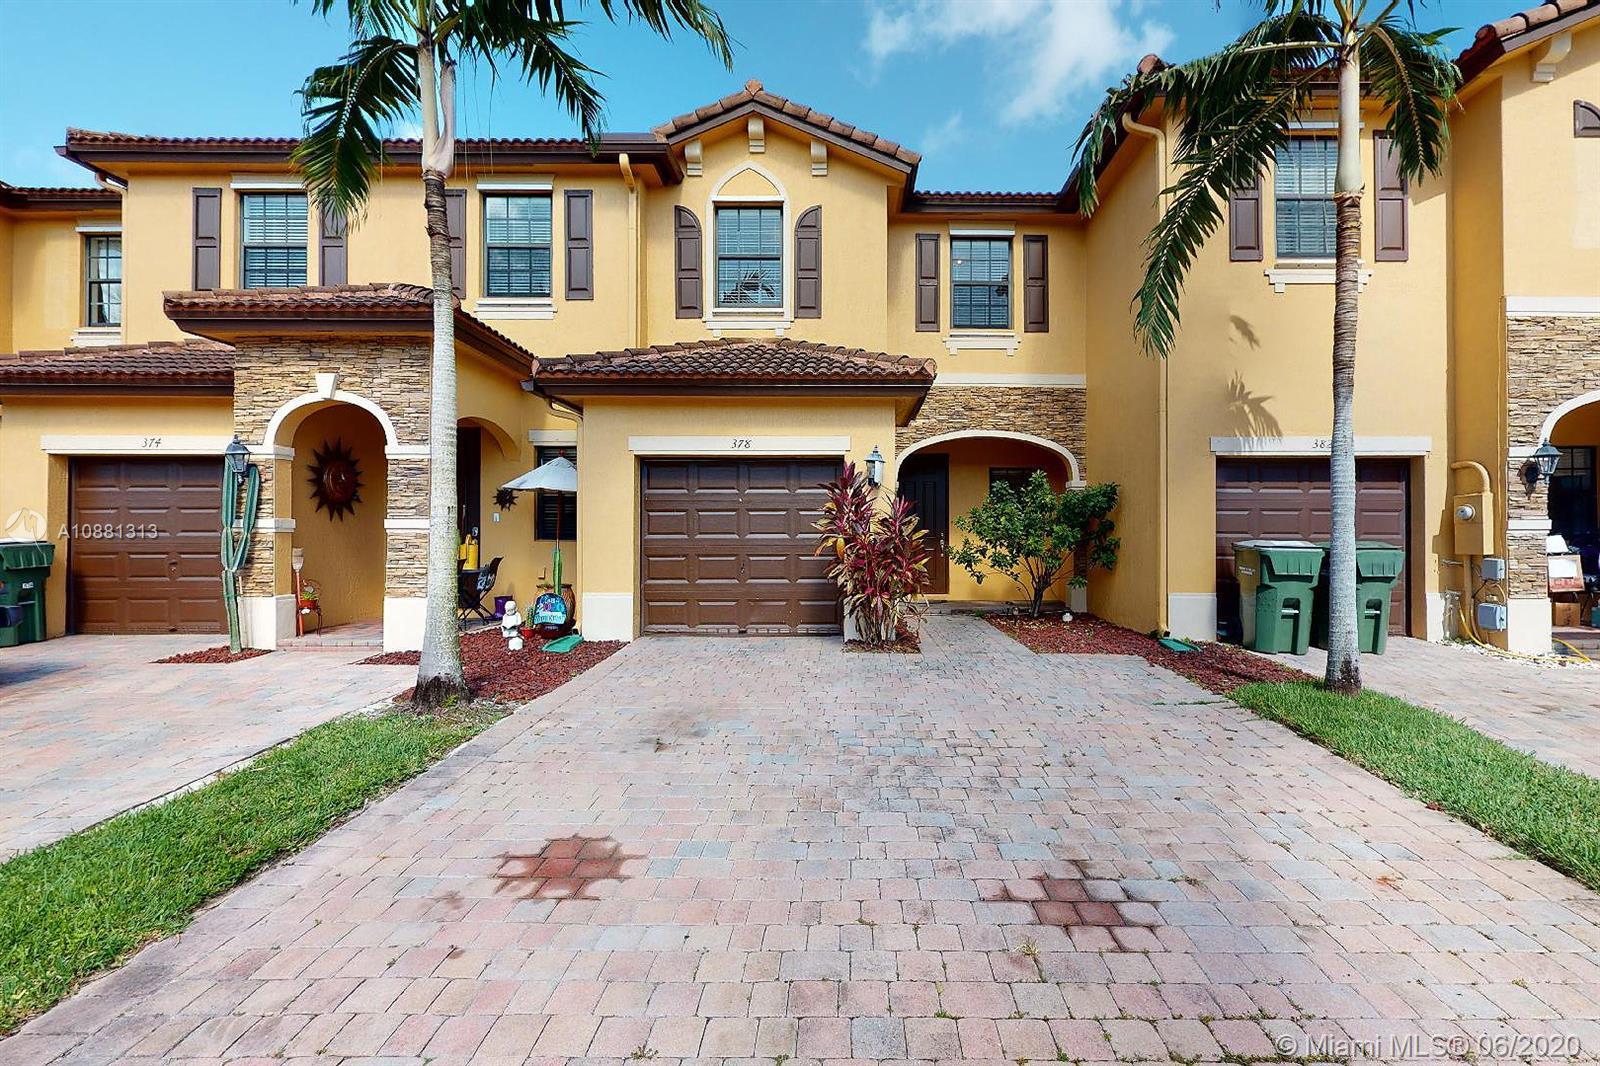 378 NE 37th Pl #378 Property Photo - Homestead, FL real estate listing